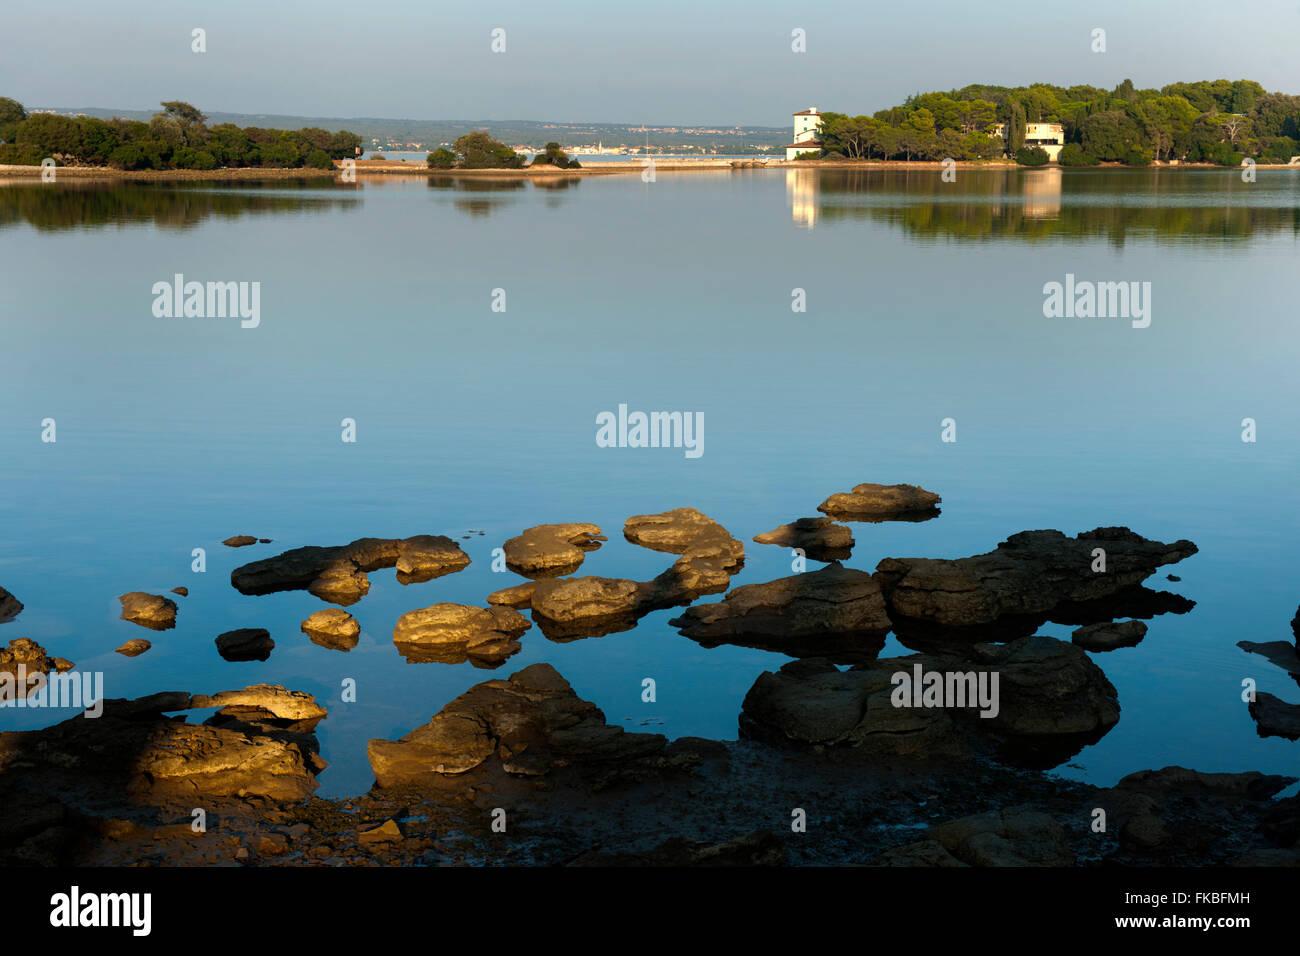 Fernsehreihe, Istrien, Insel Veli Brijuni Im Nationalpark Brijuni-Inseln Vor Pula. Stockbild